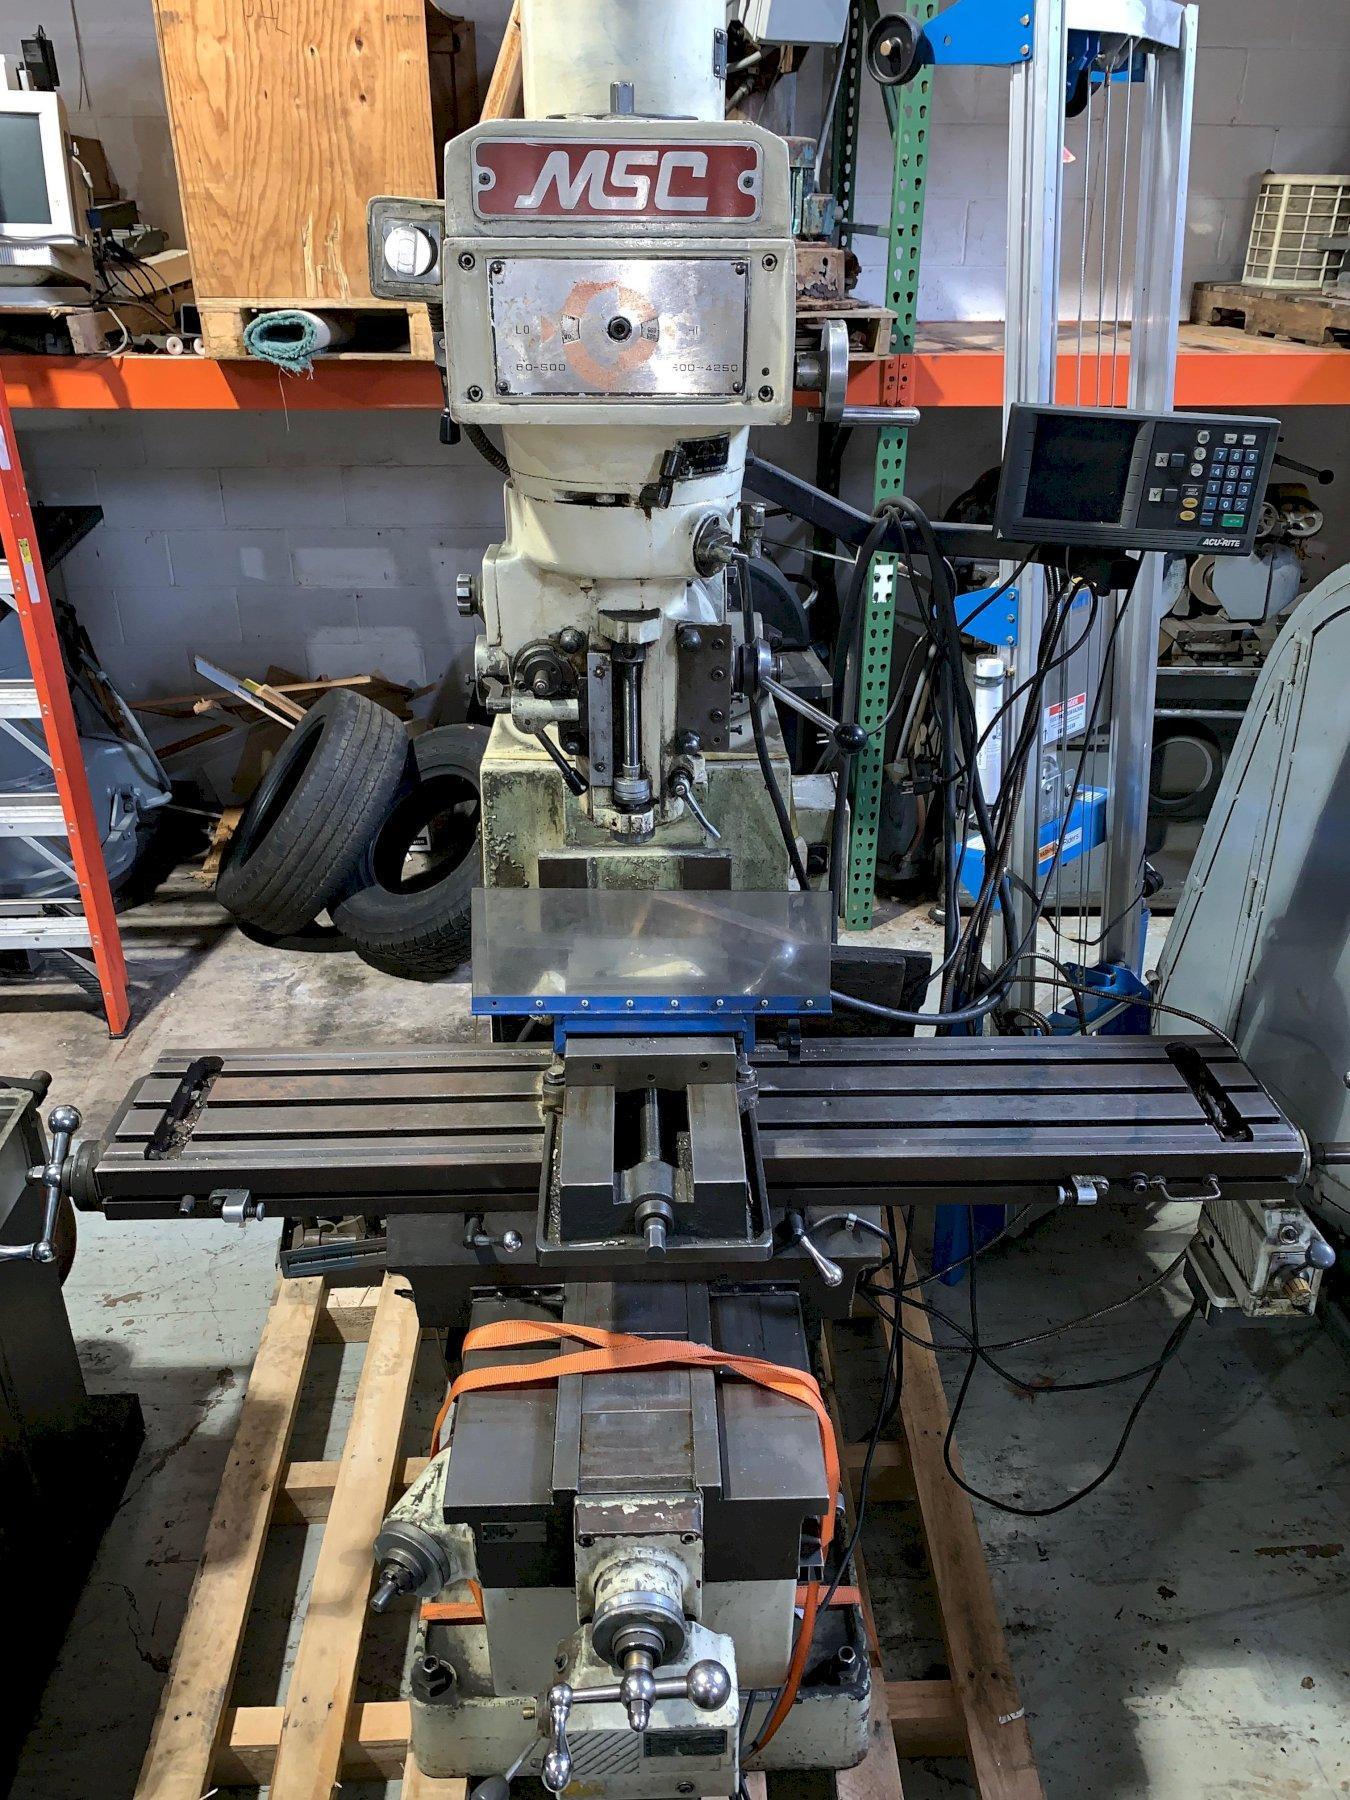 MSC Vertical Milling Machine